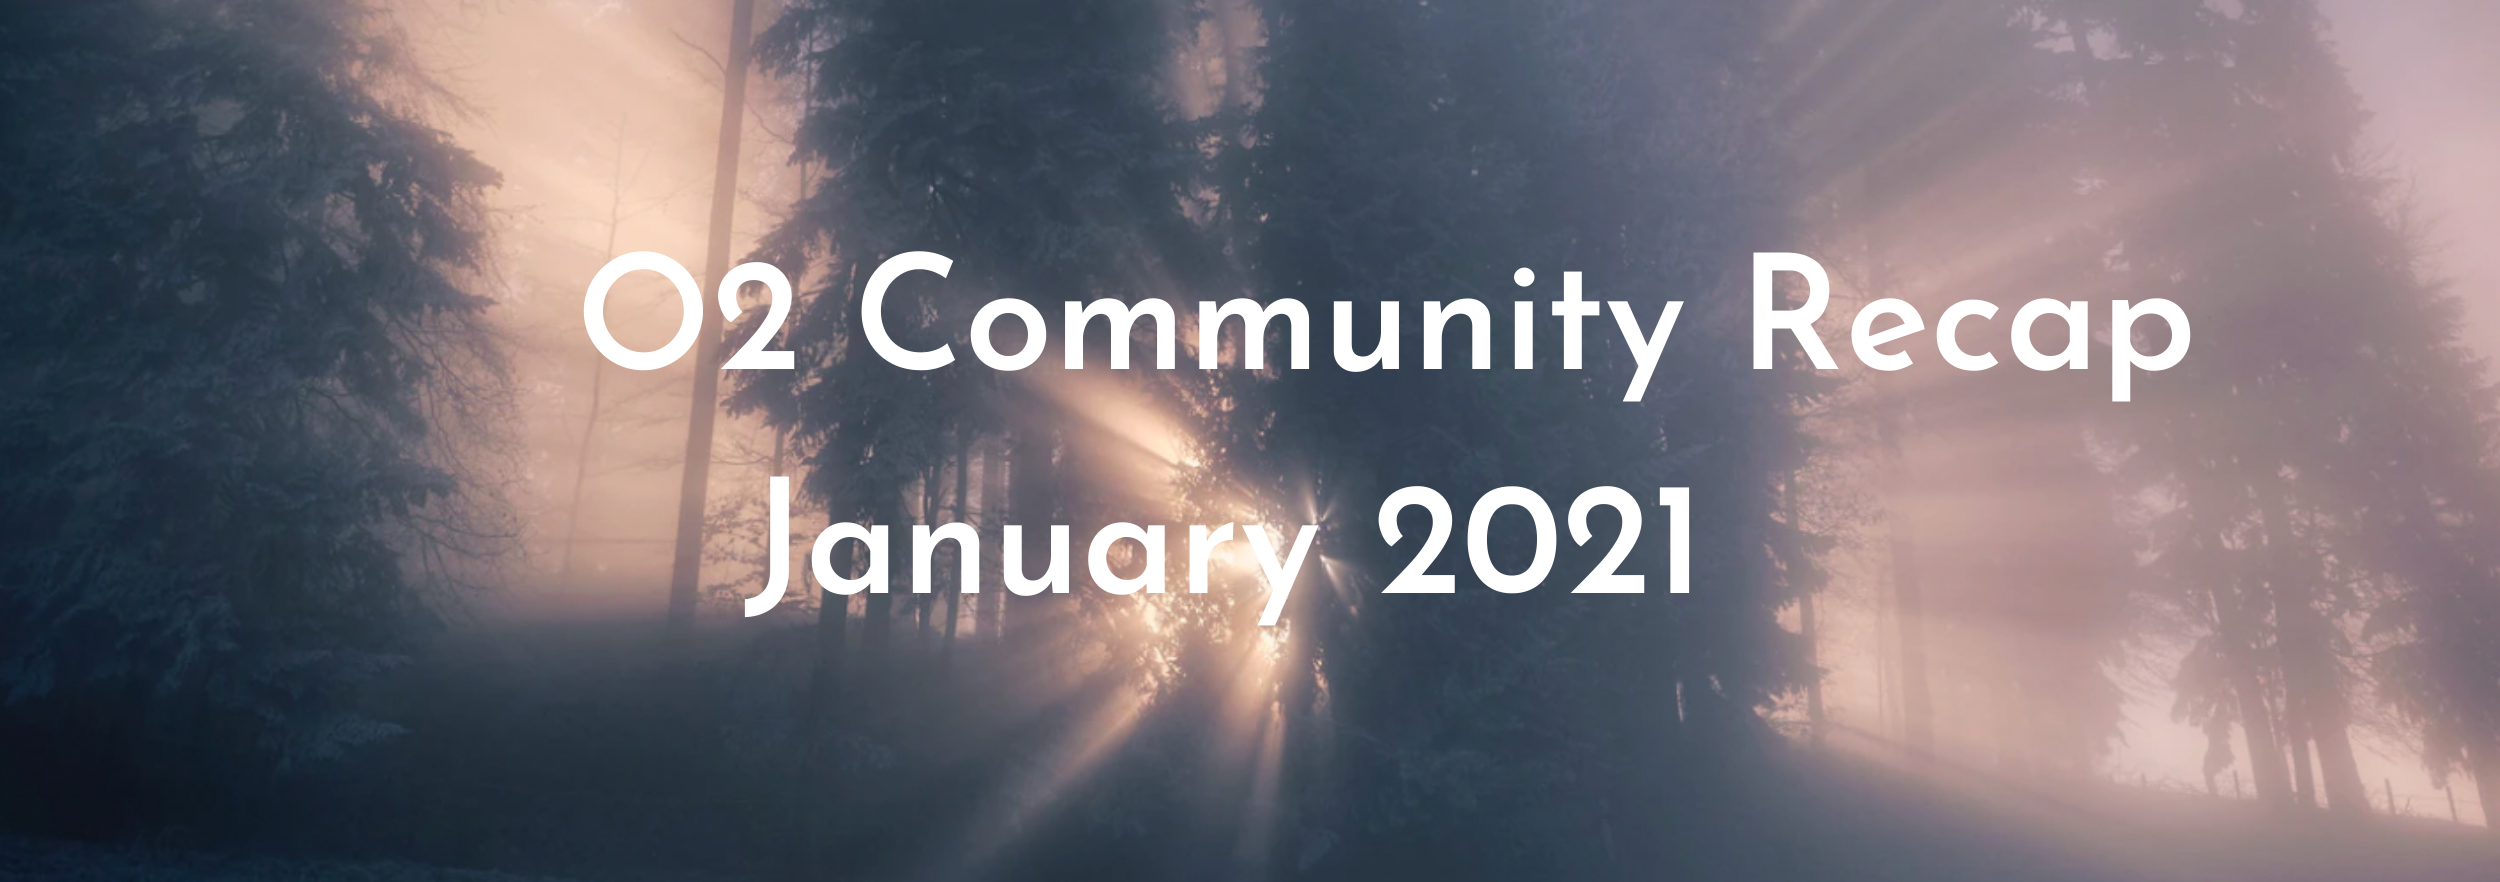 O2 Community recap August 2020 (1).png